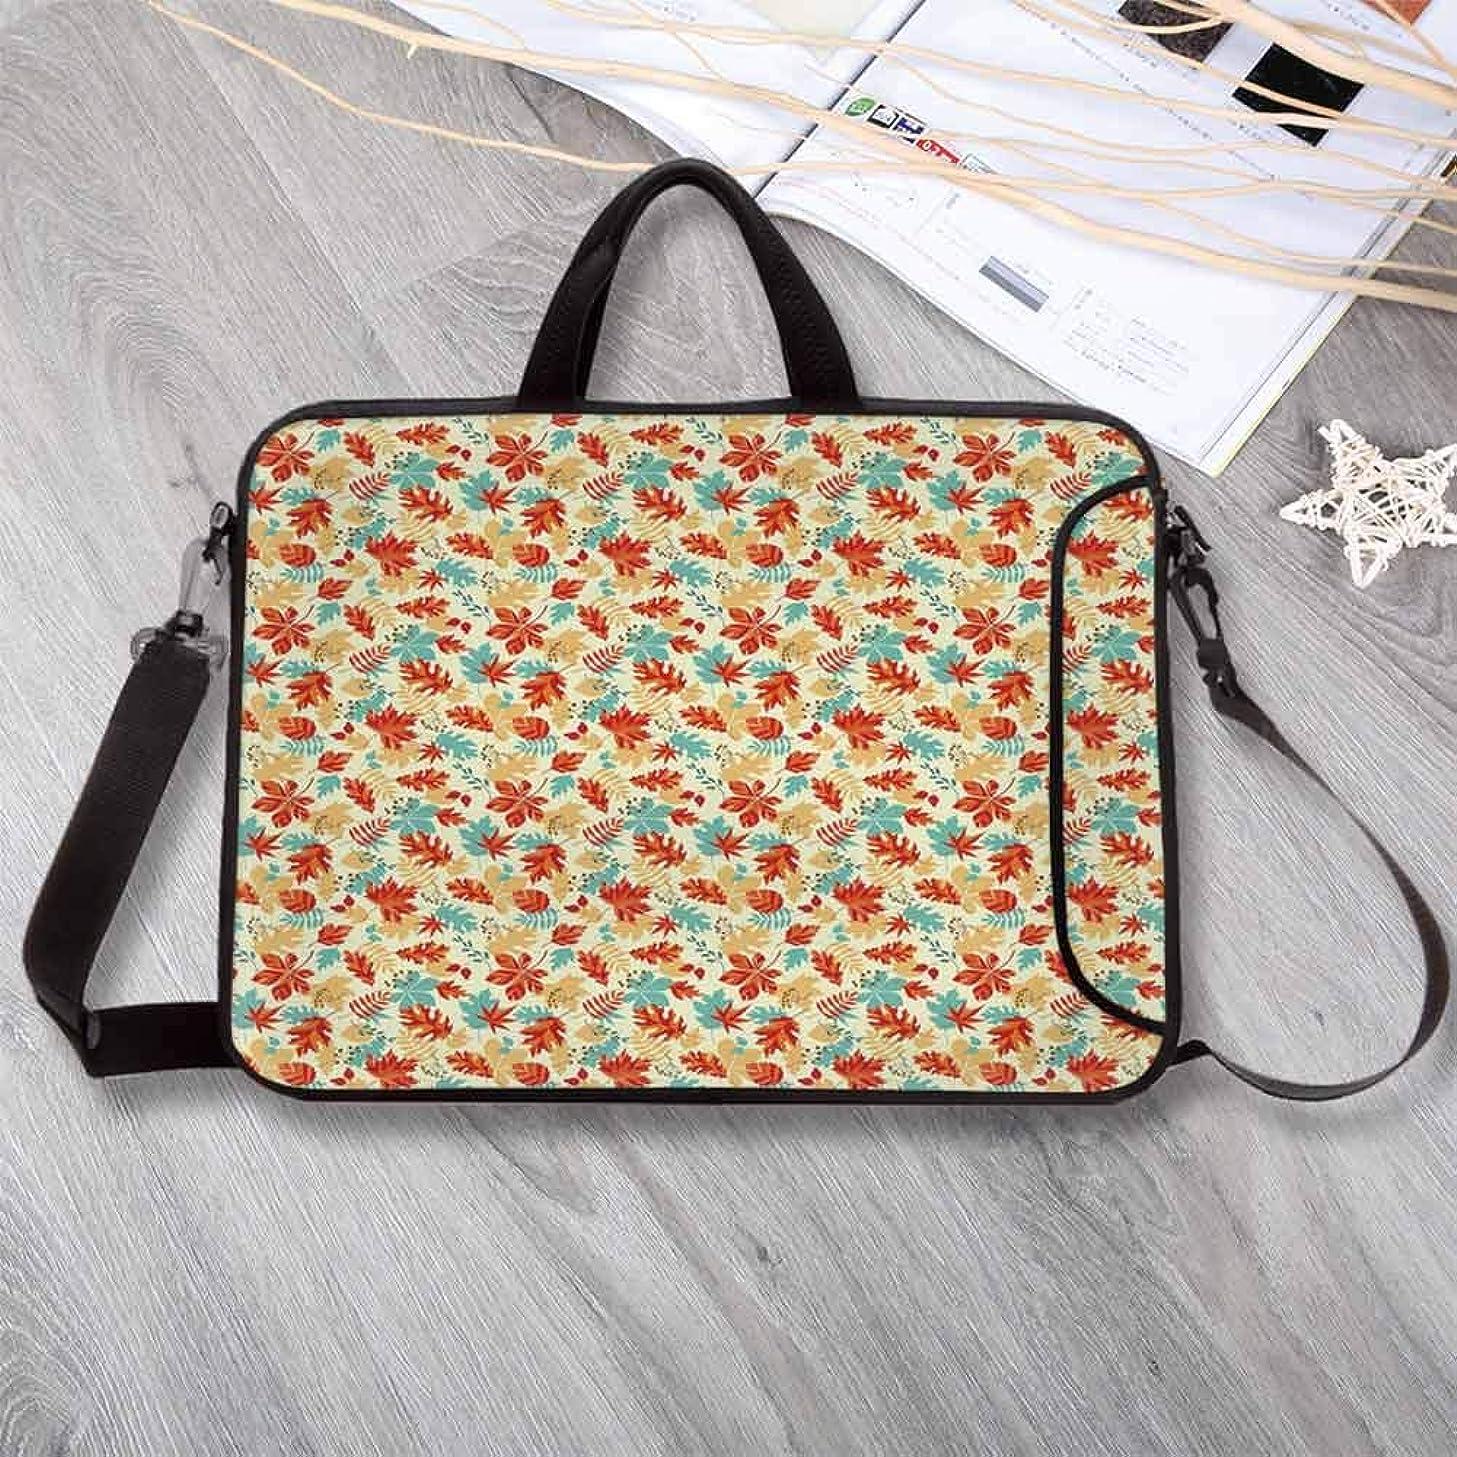 "Leaf Custom Neoprene Laptop Bag,Autumn Spring Time Vivid Flowers Berries Buds Abstract Laptop Bag for Men Women Students,14.6""L x 10.6""W x 0.8""H"